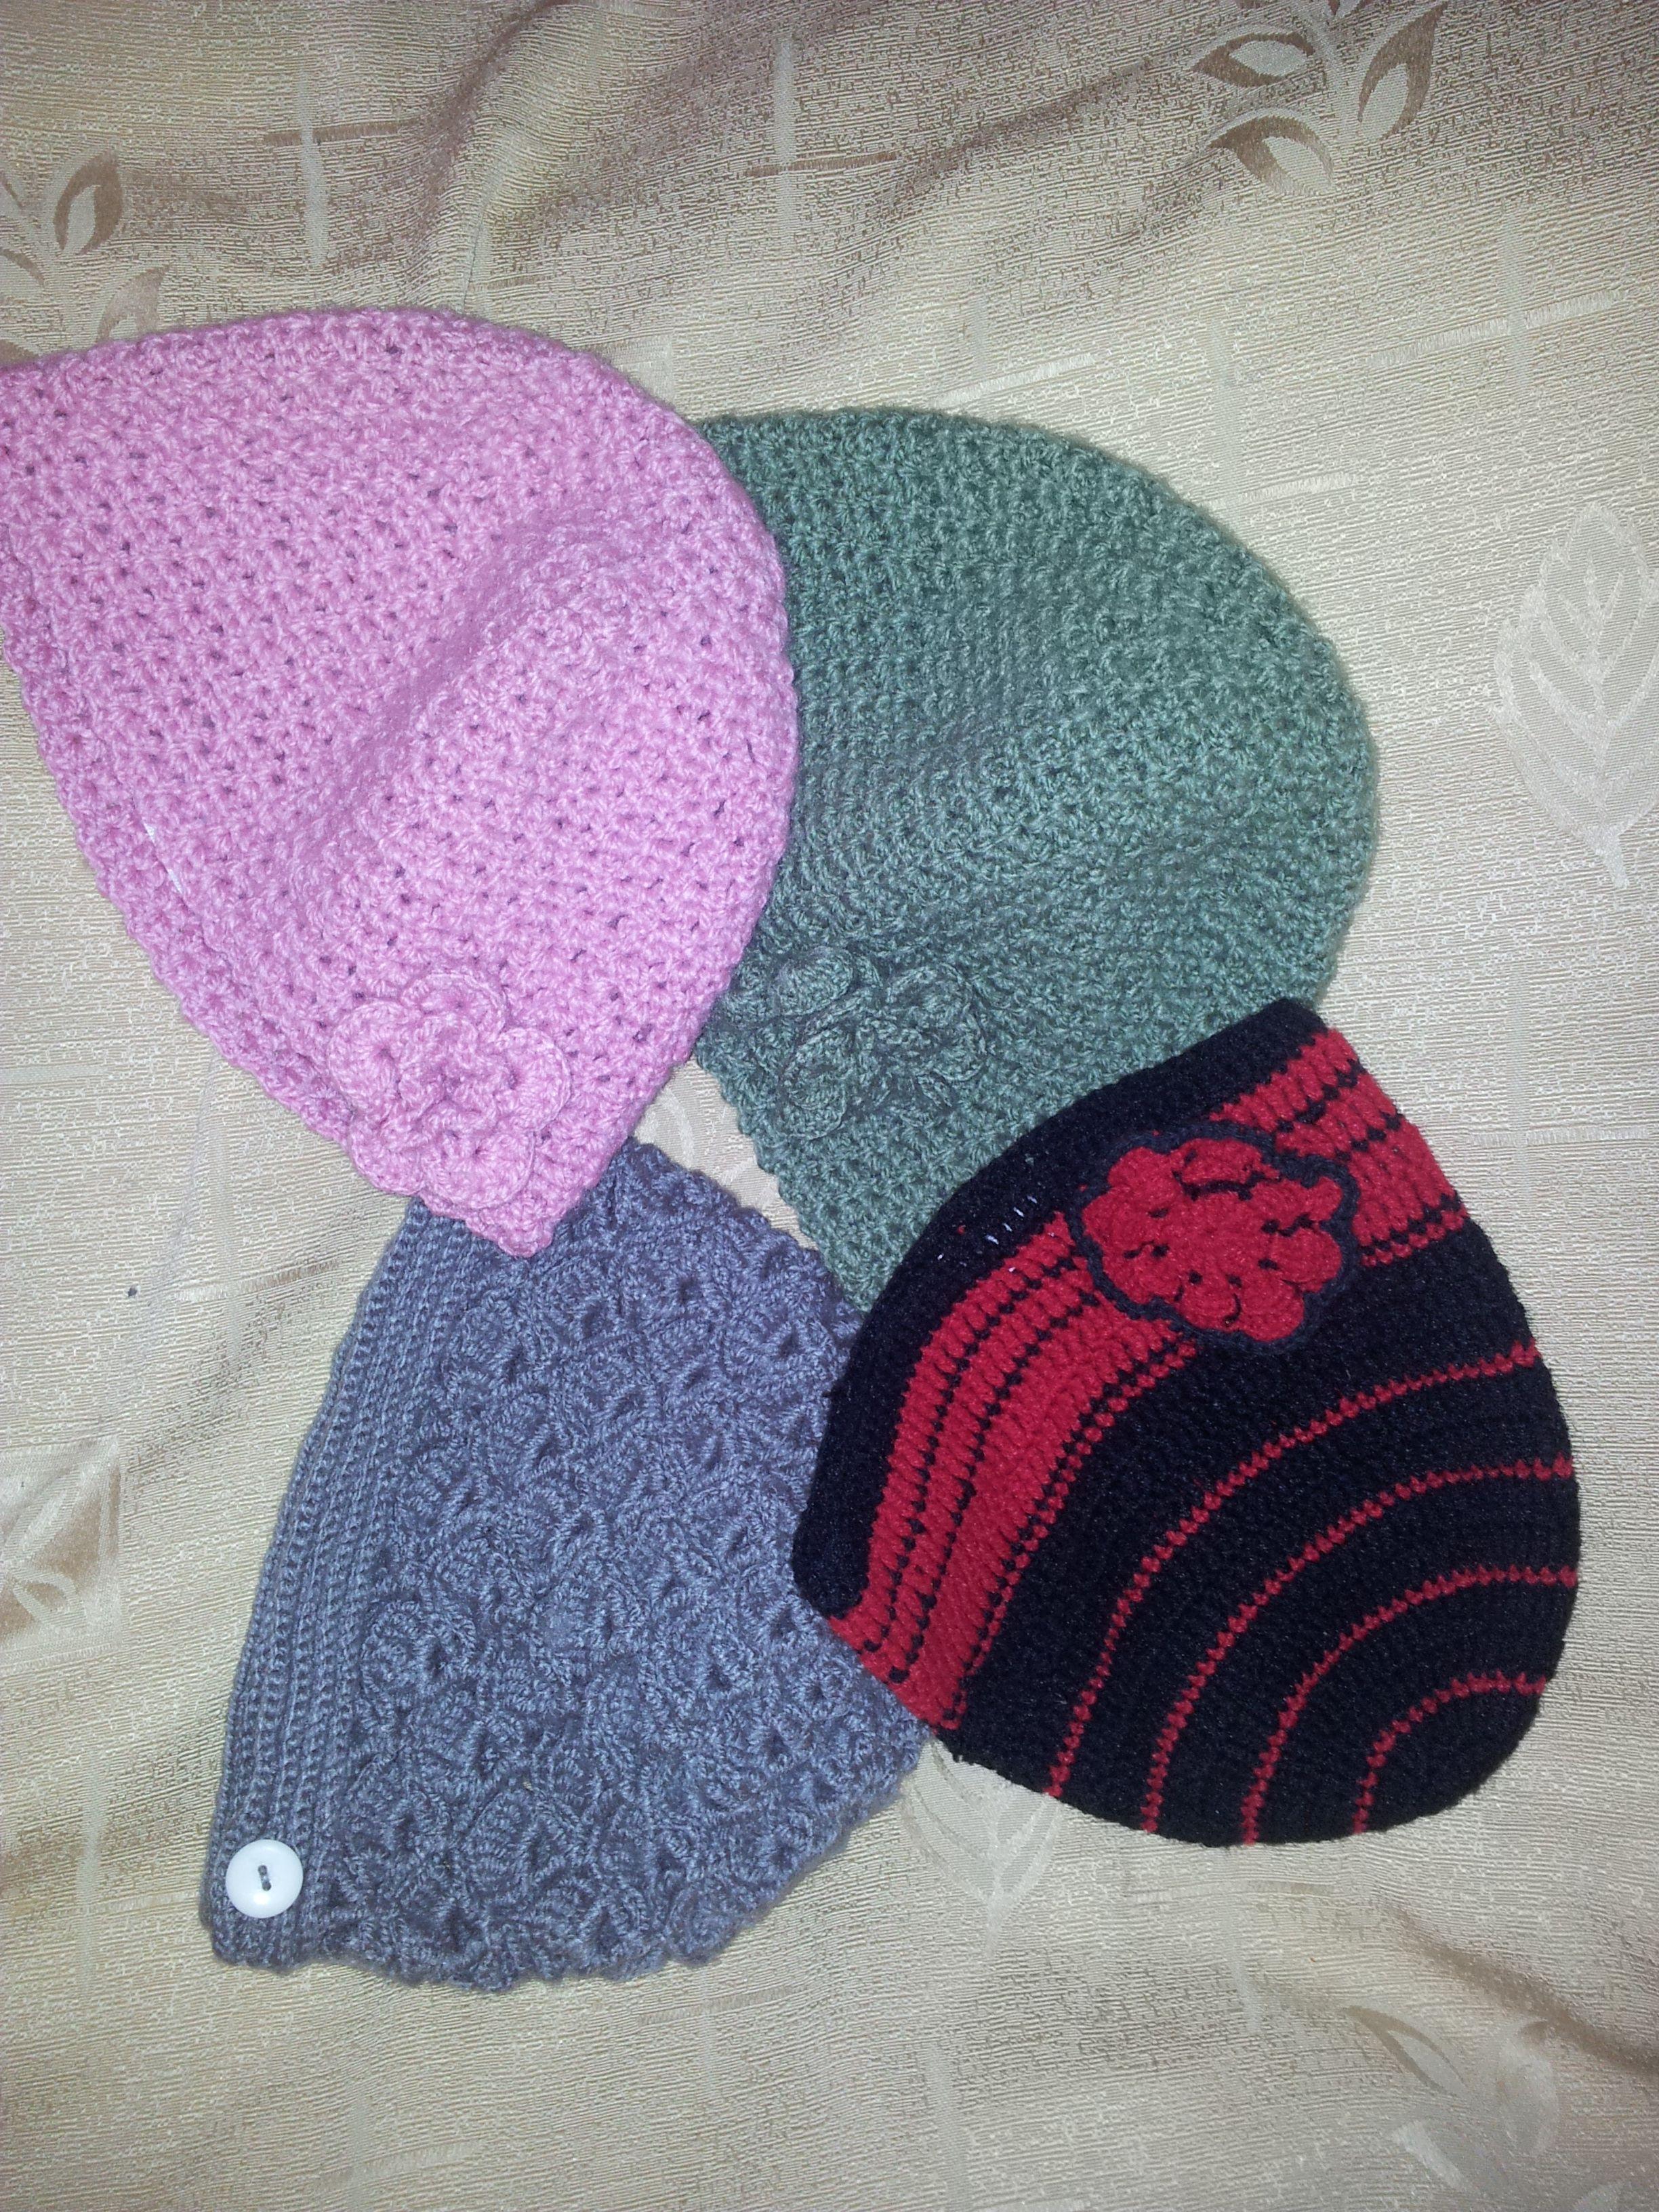 #Tejido #Gorros #Crochet #knit